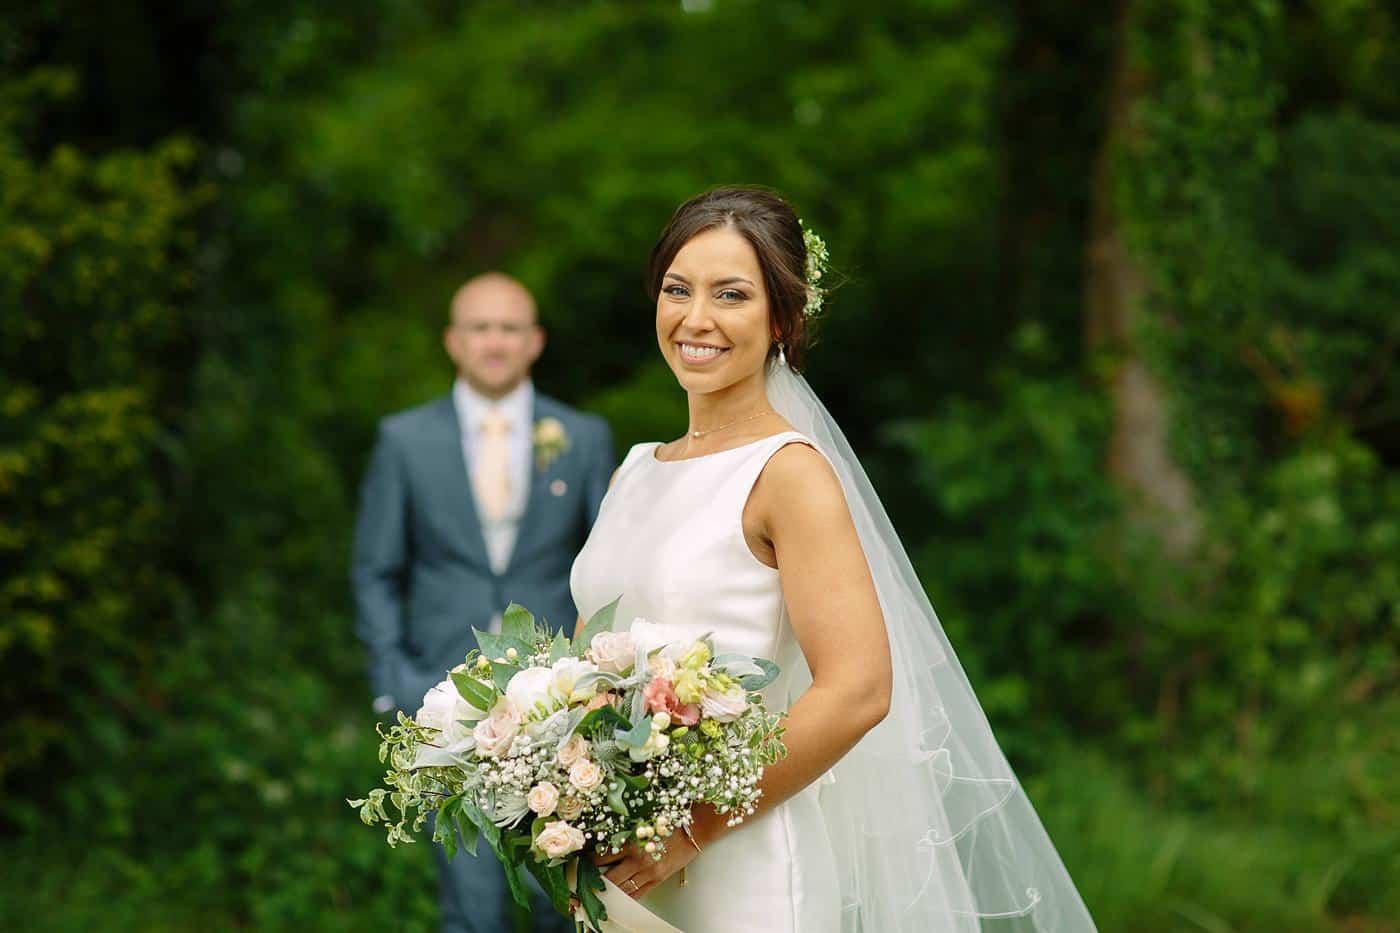 Winstanstow wedding photography 0698